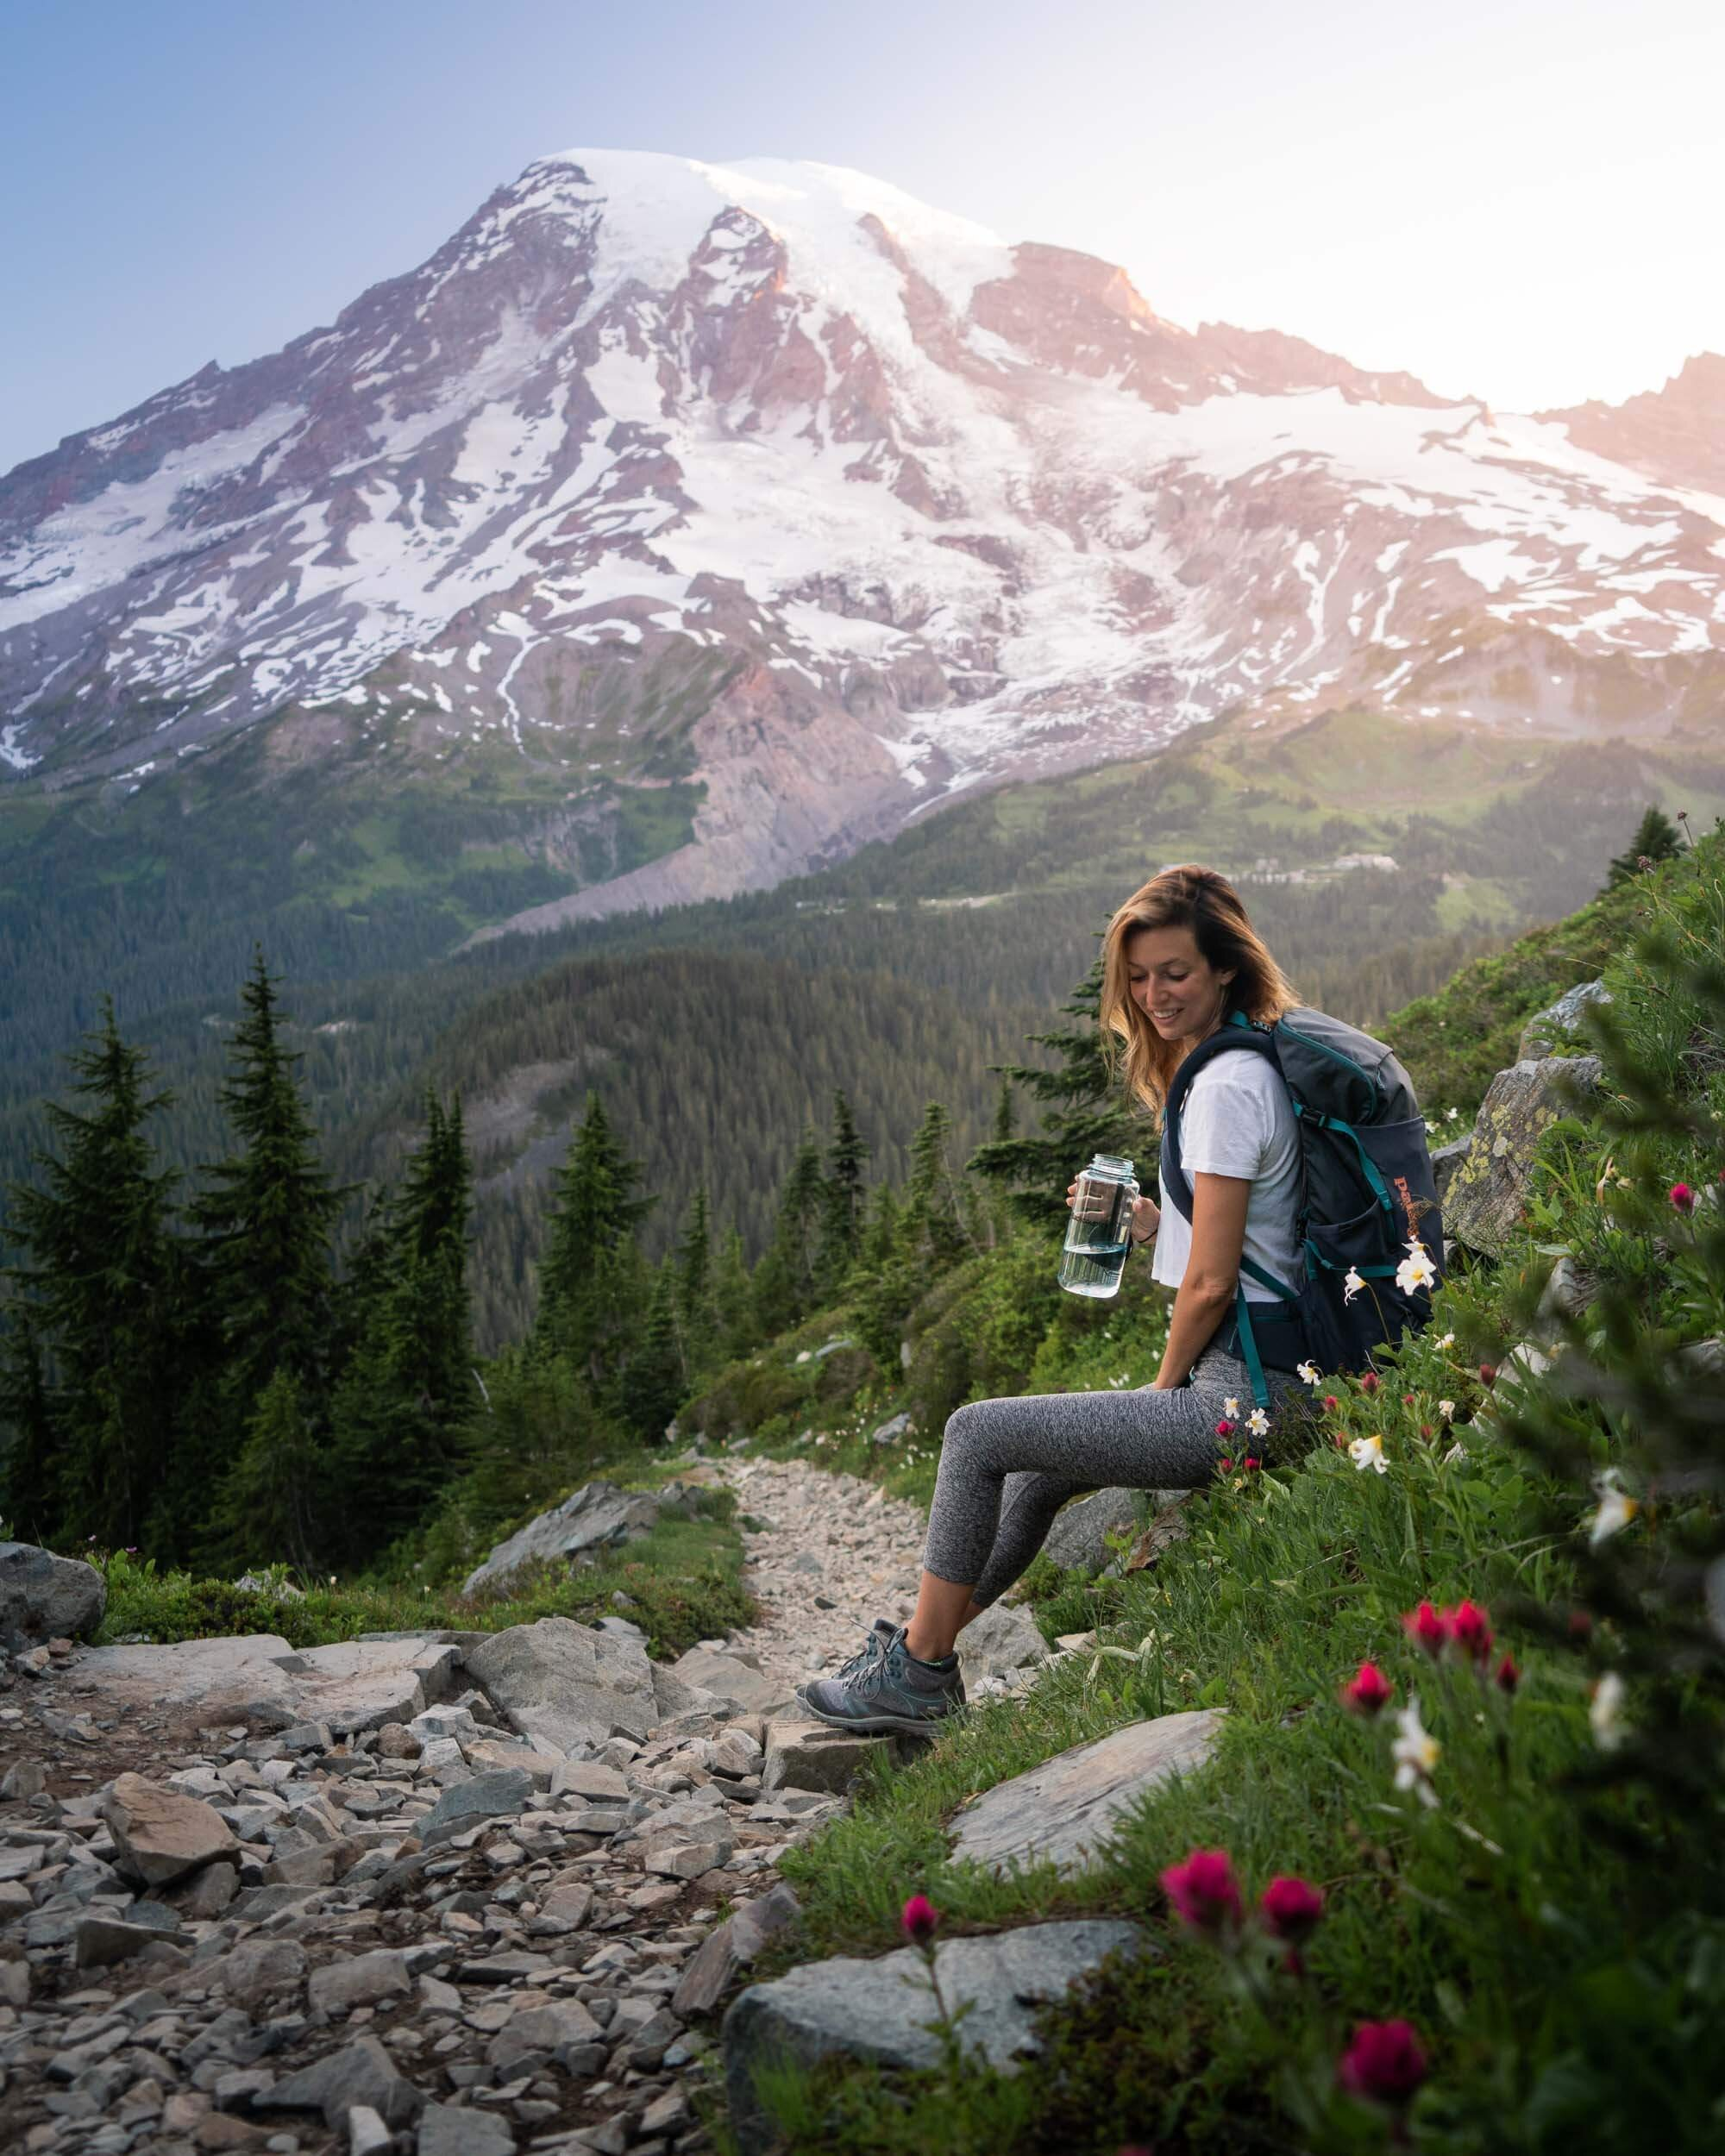 Taking a break on the Pinnacle Peak Trail at Mount Rainier. Wearing: Keen  Hiking Boots , Beyond Yoga  Leggings , Patagonia  Day Pack , and drinking out of my  Nalgene . View from Pinnacle Ridge at Mount Rainier.